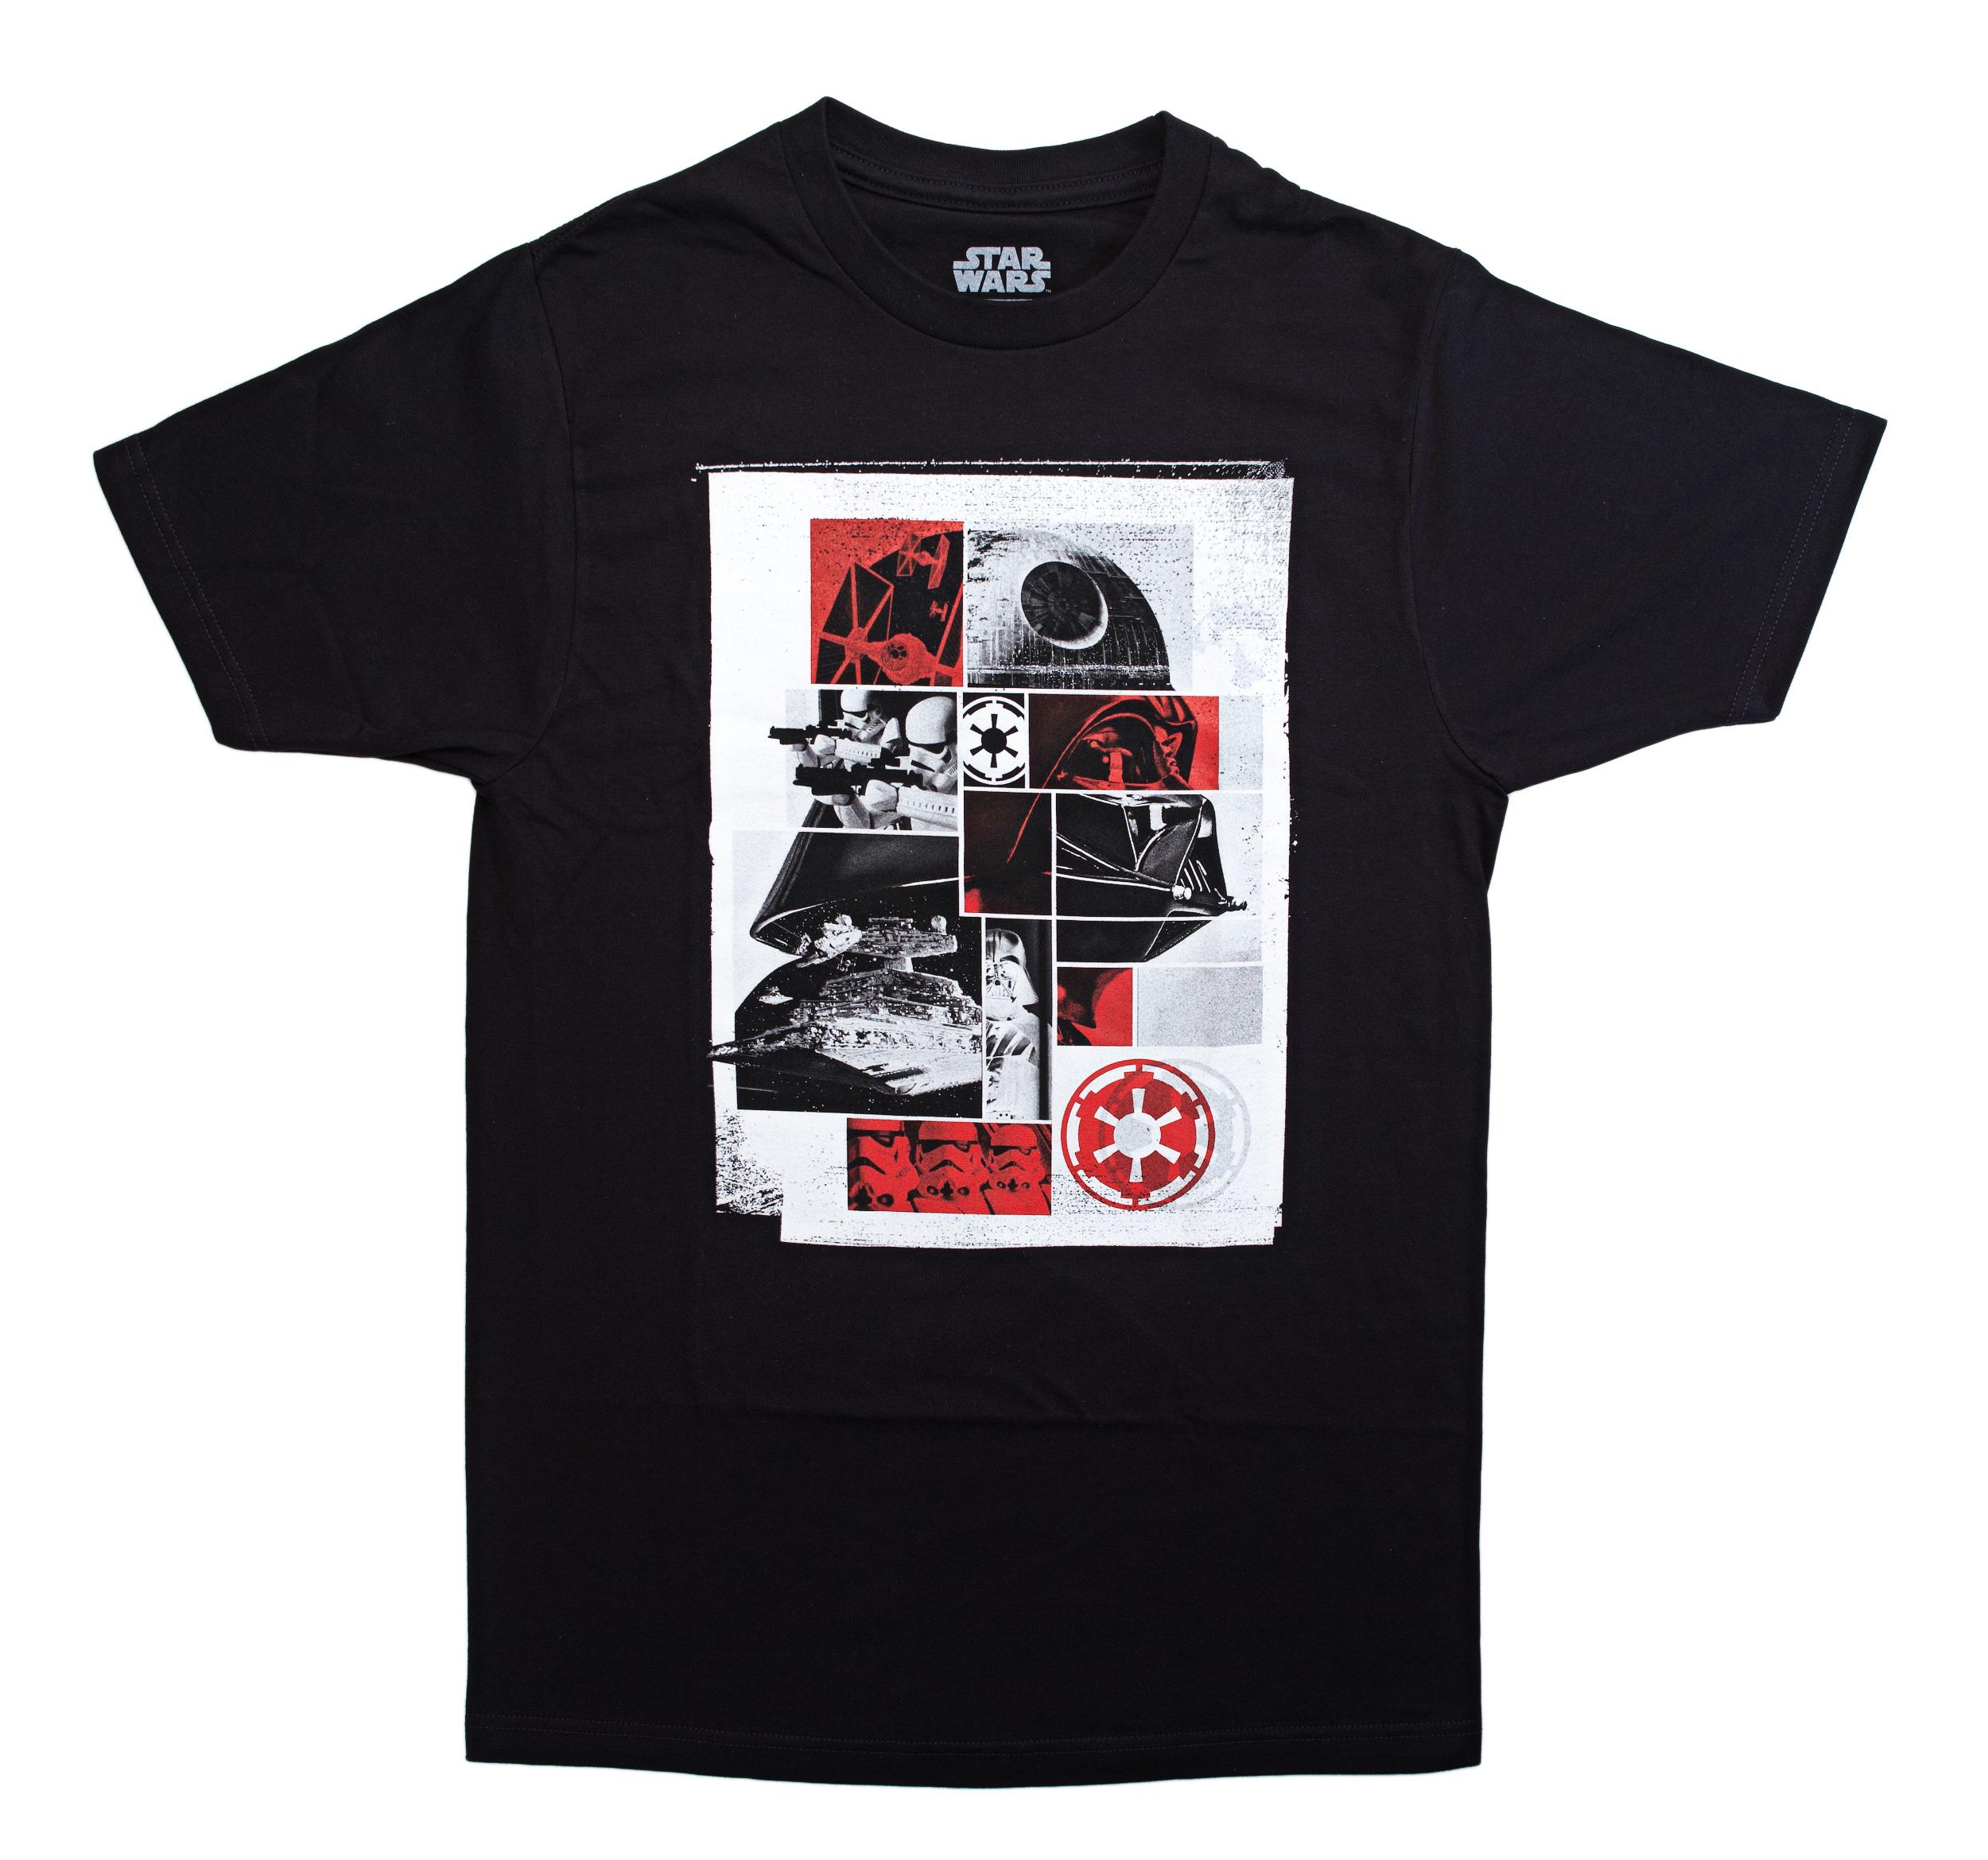 Star Wars Vader Grid Collage Graphic T-Shirt   2XL